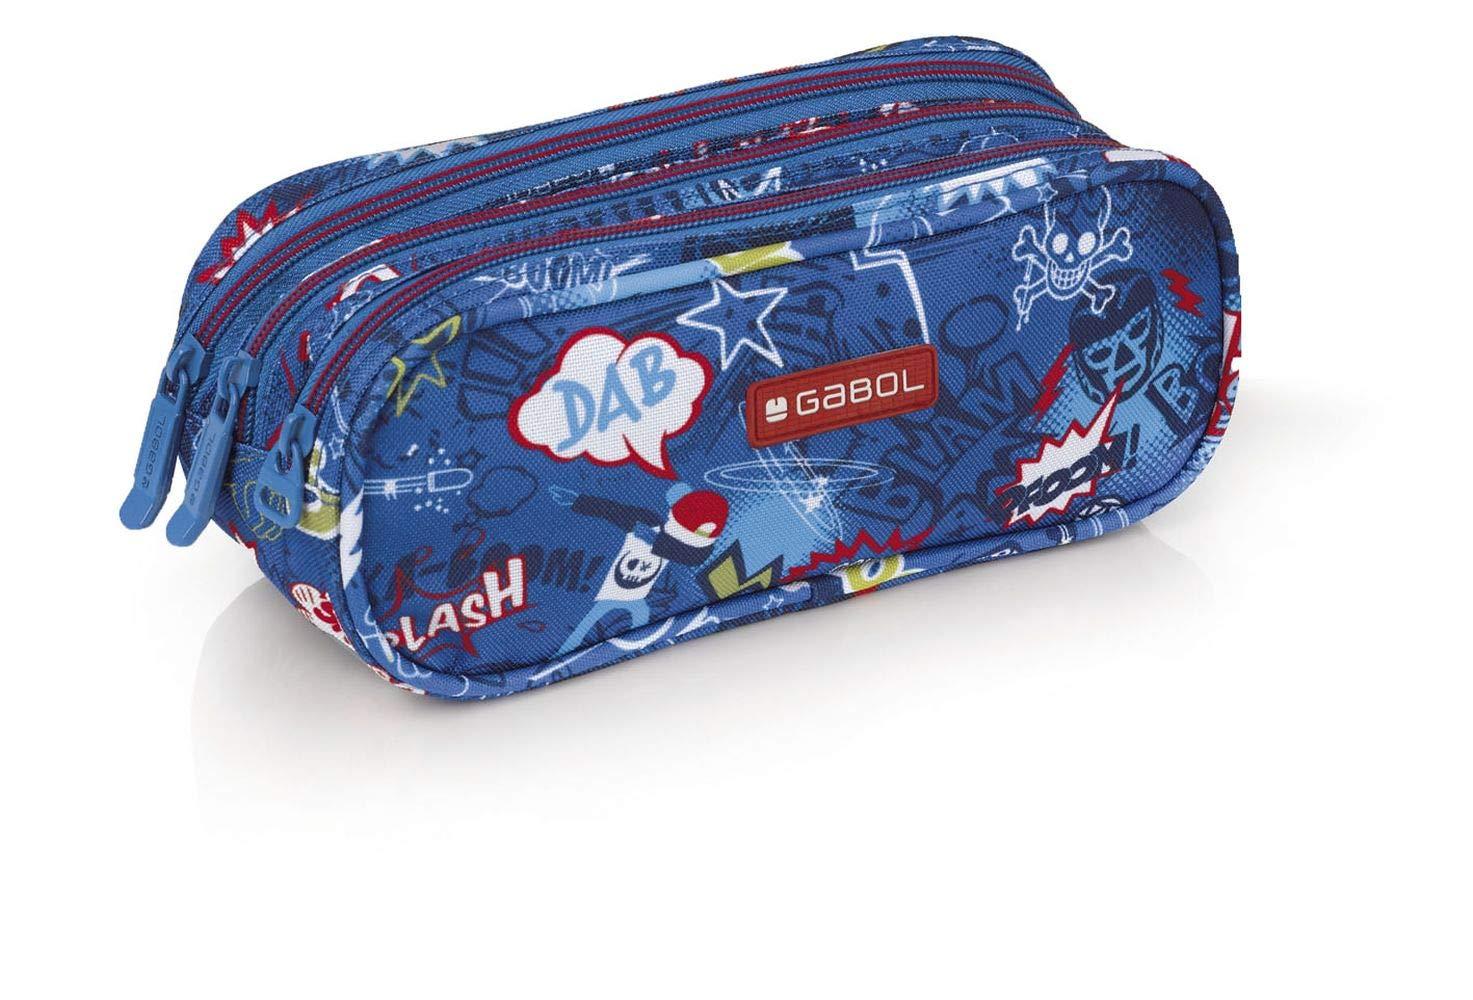 Gabol Portatodo Triple Bang Mochila Infantil, 22 cm, Multicolor